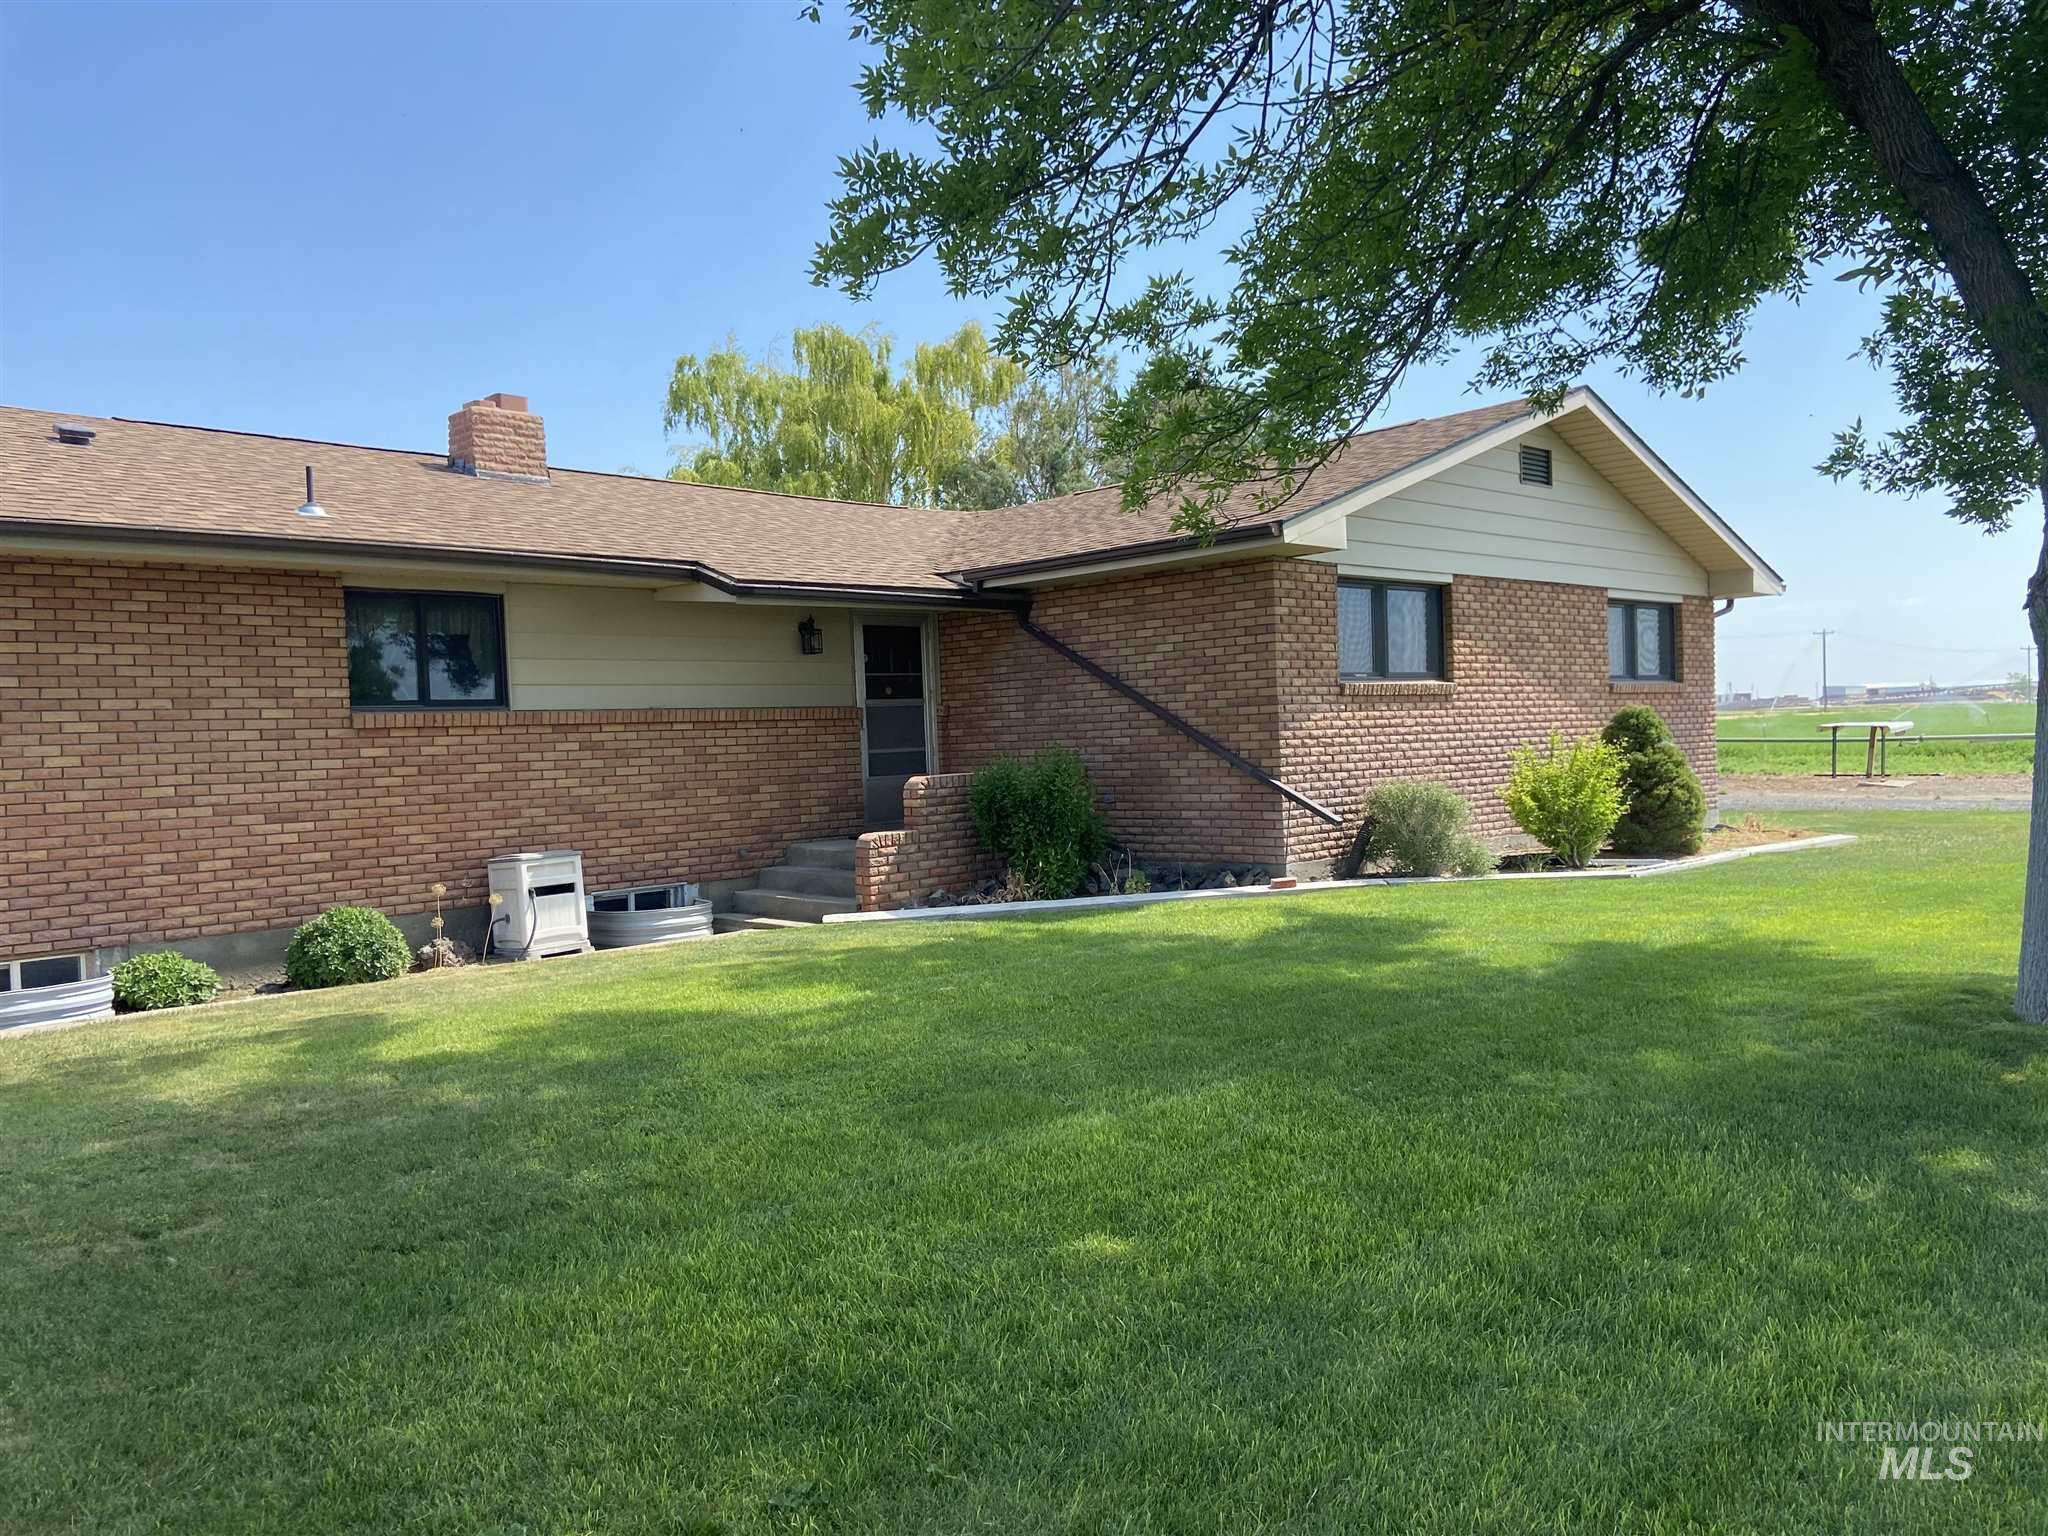 83321 Real Estate Listings Main Image